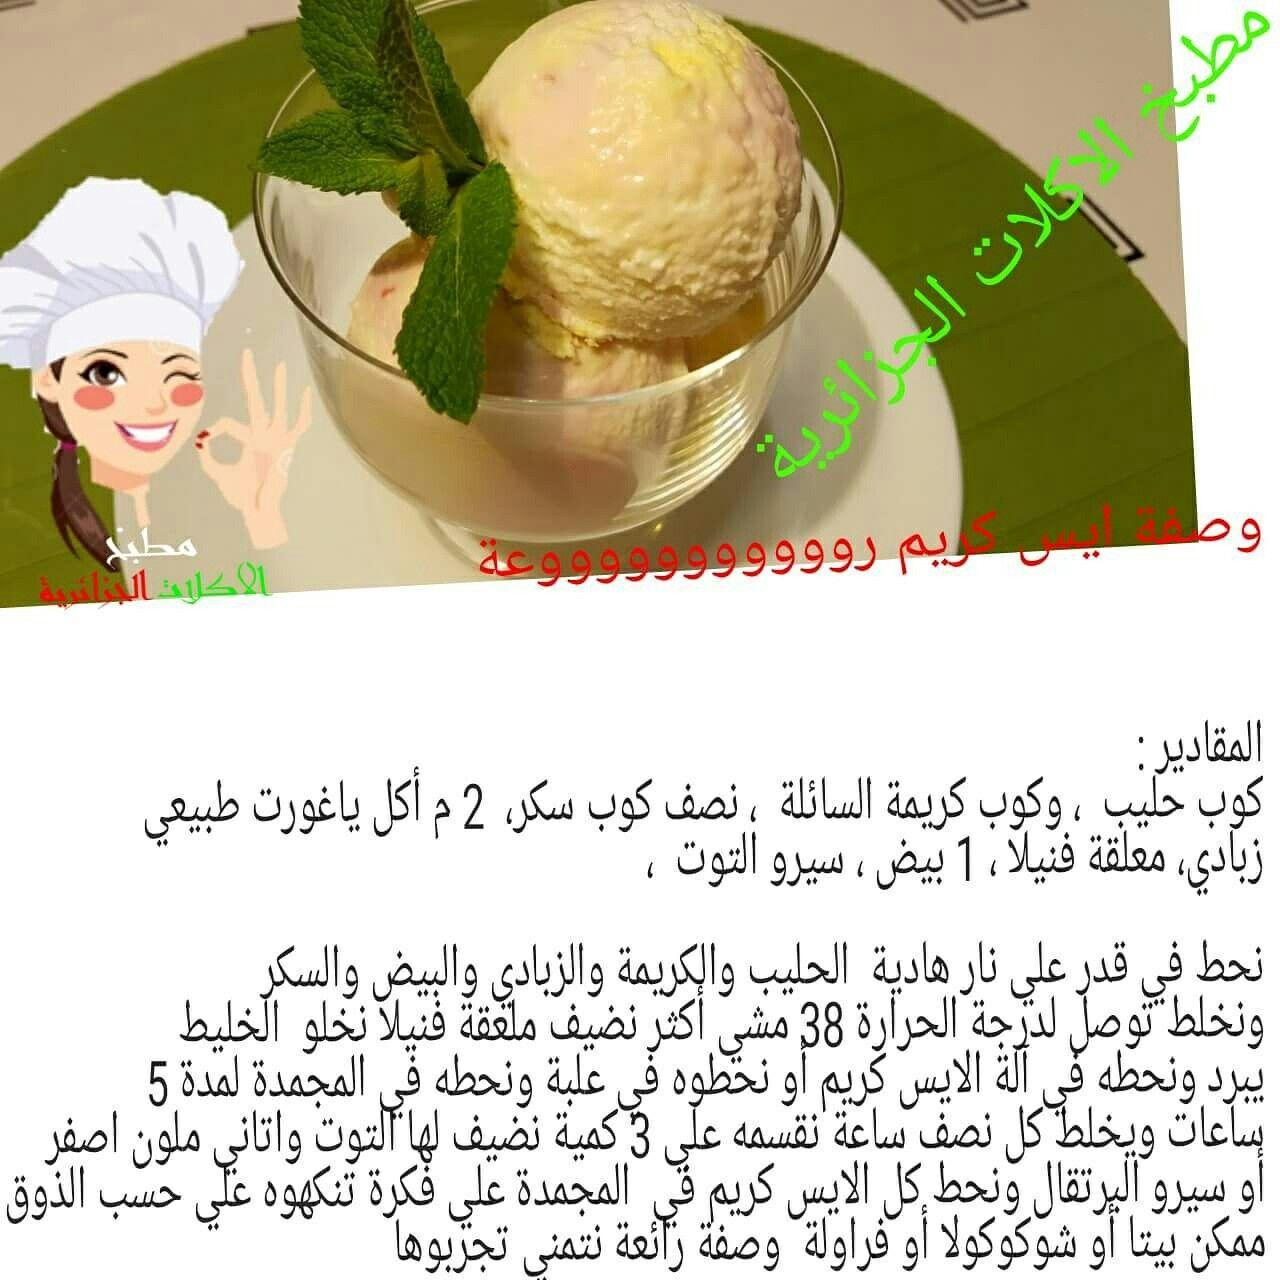 للمزيد من الوصفات زورو قناتي علي اليوتيوب Nawal L Algerienne Cook Food Desserts Fruit